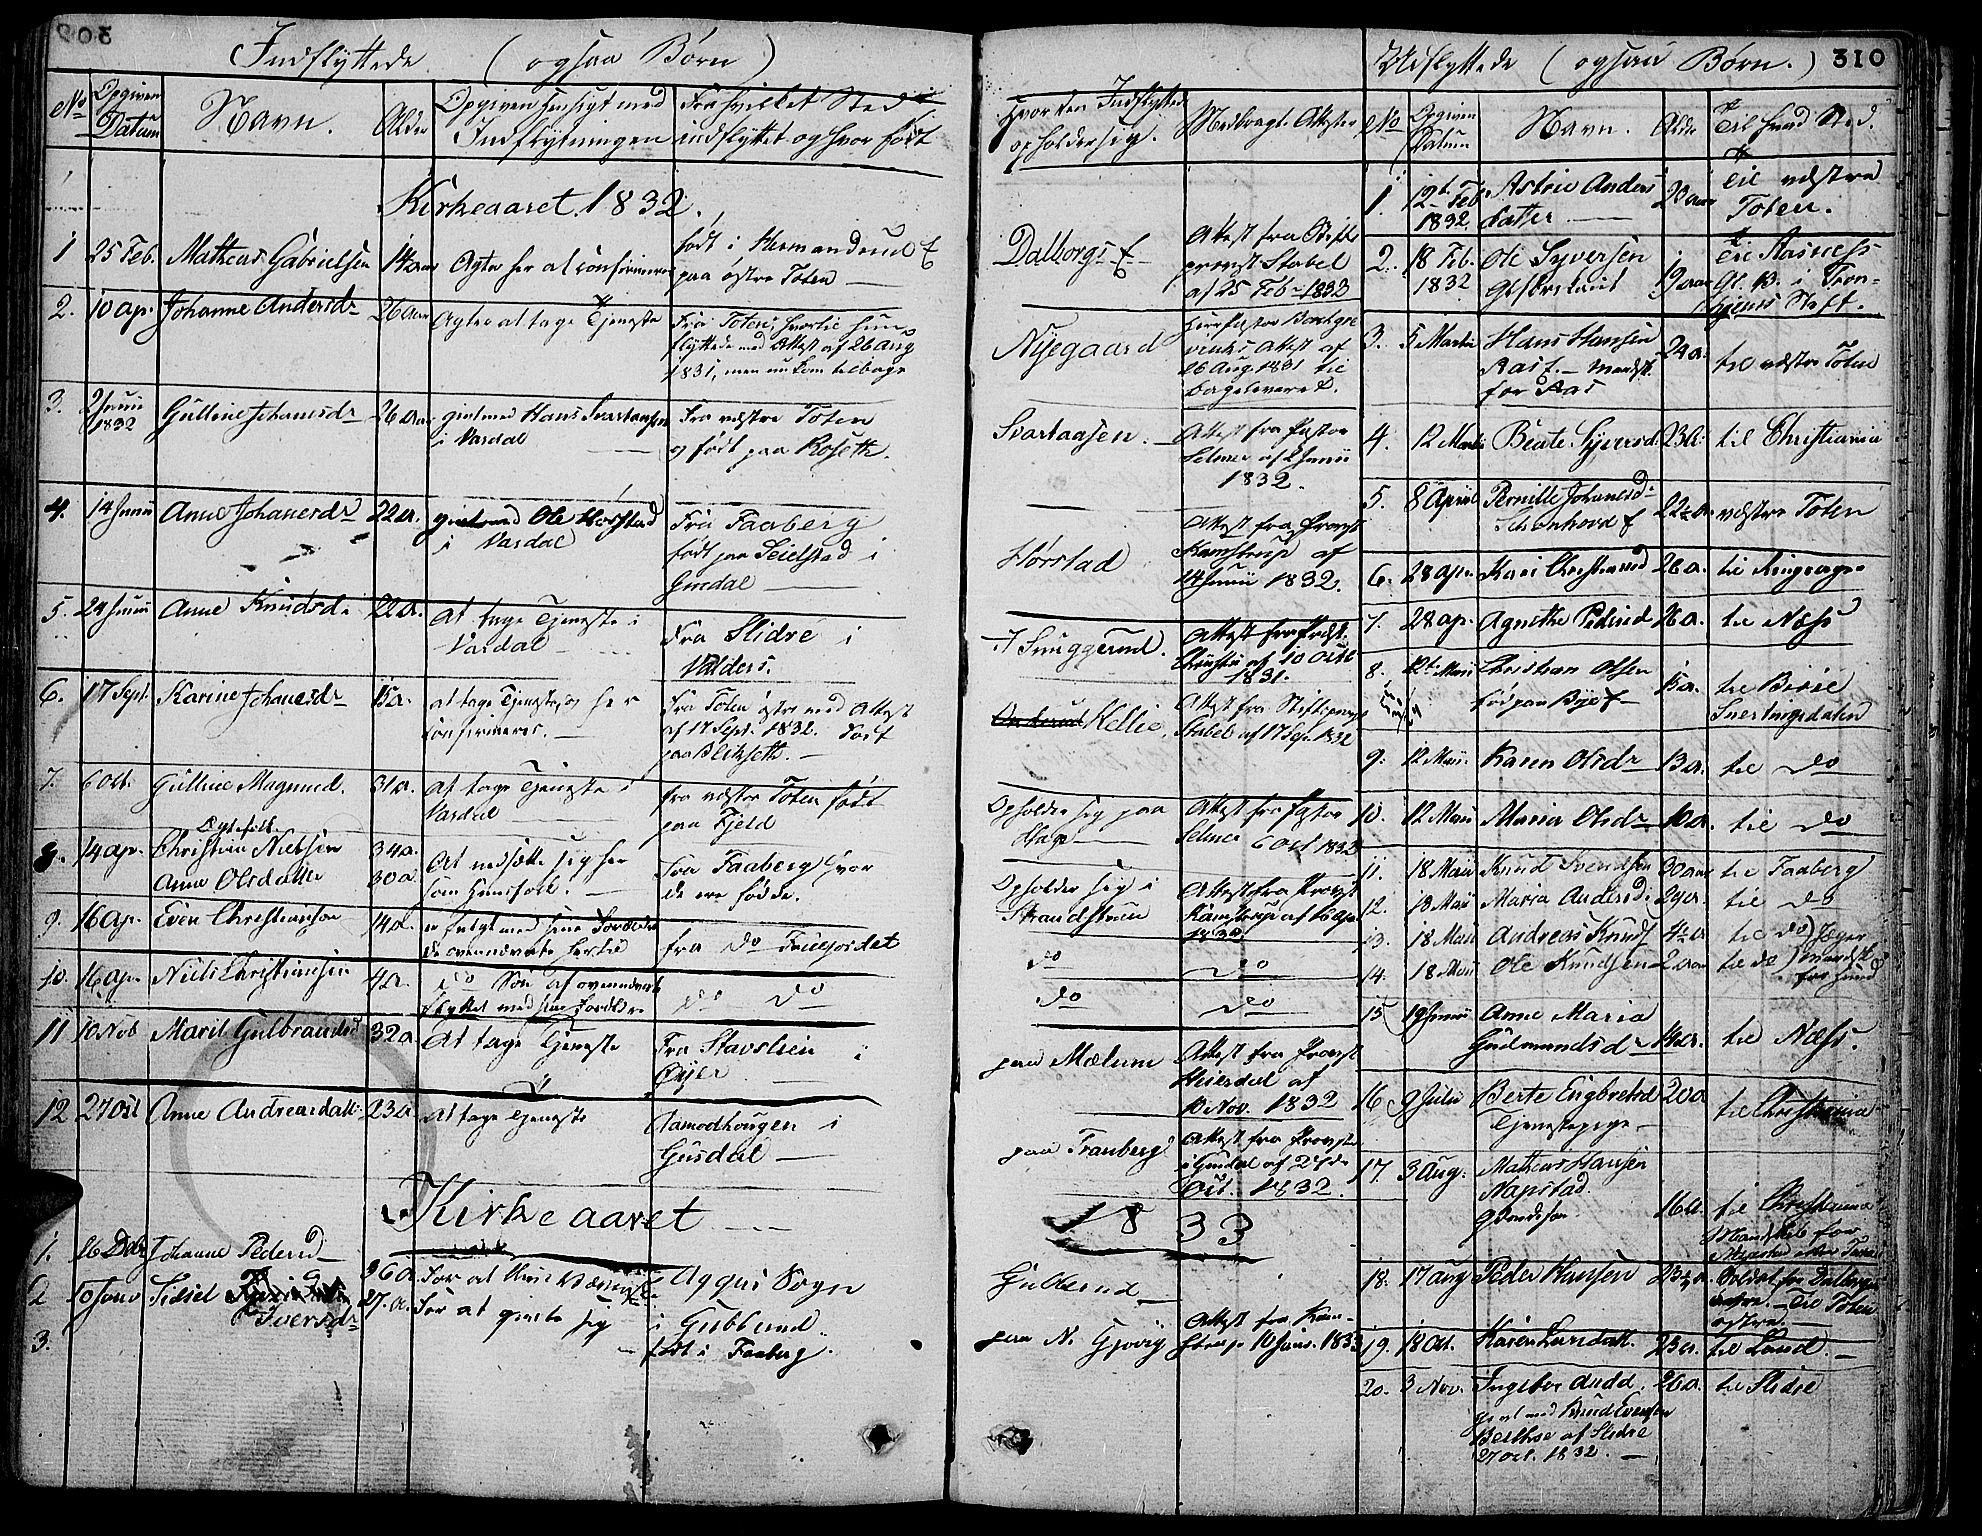 SAH, Vardal prestekontor, H/Ha/Hab/L0004: Klokkerbok nr. 4, 1831-1853, s. 310